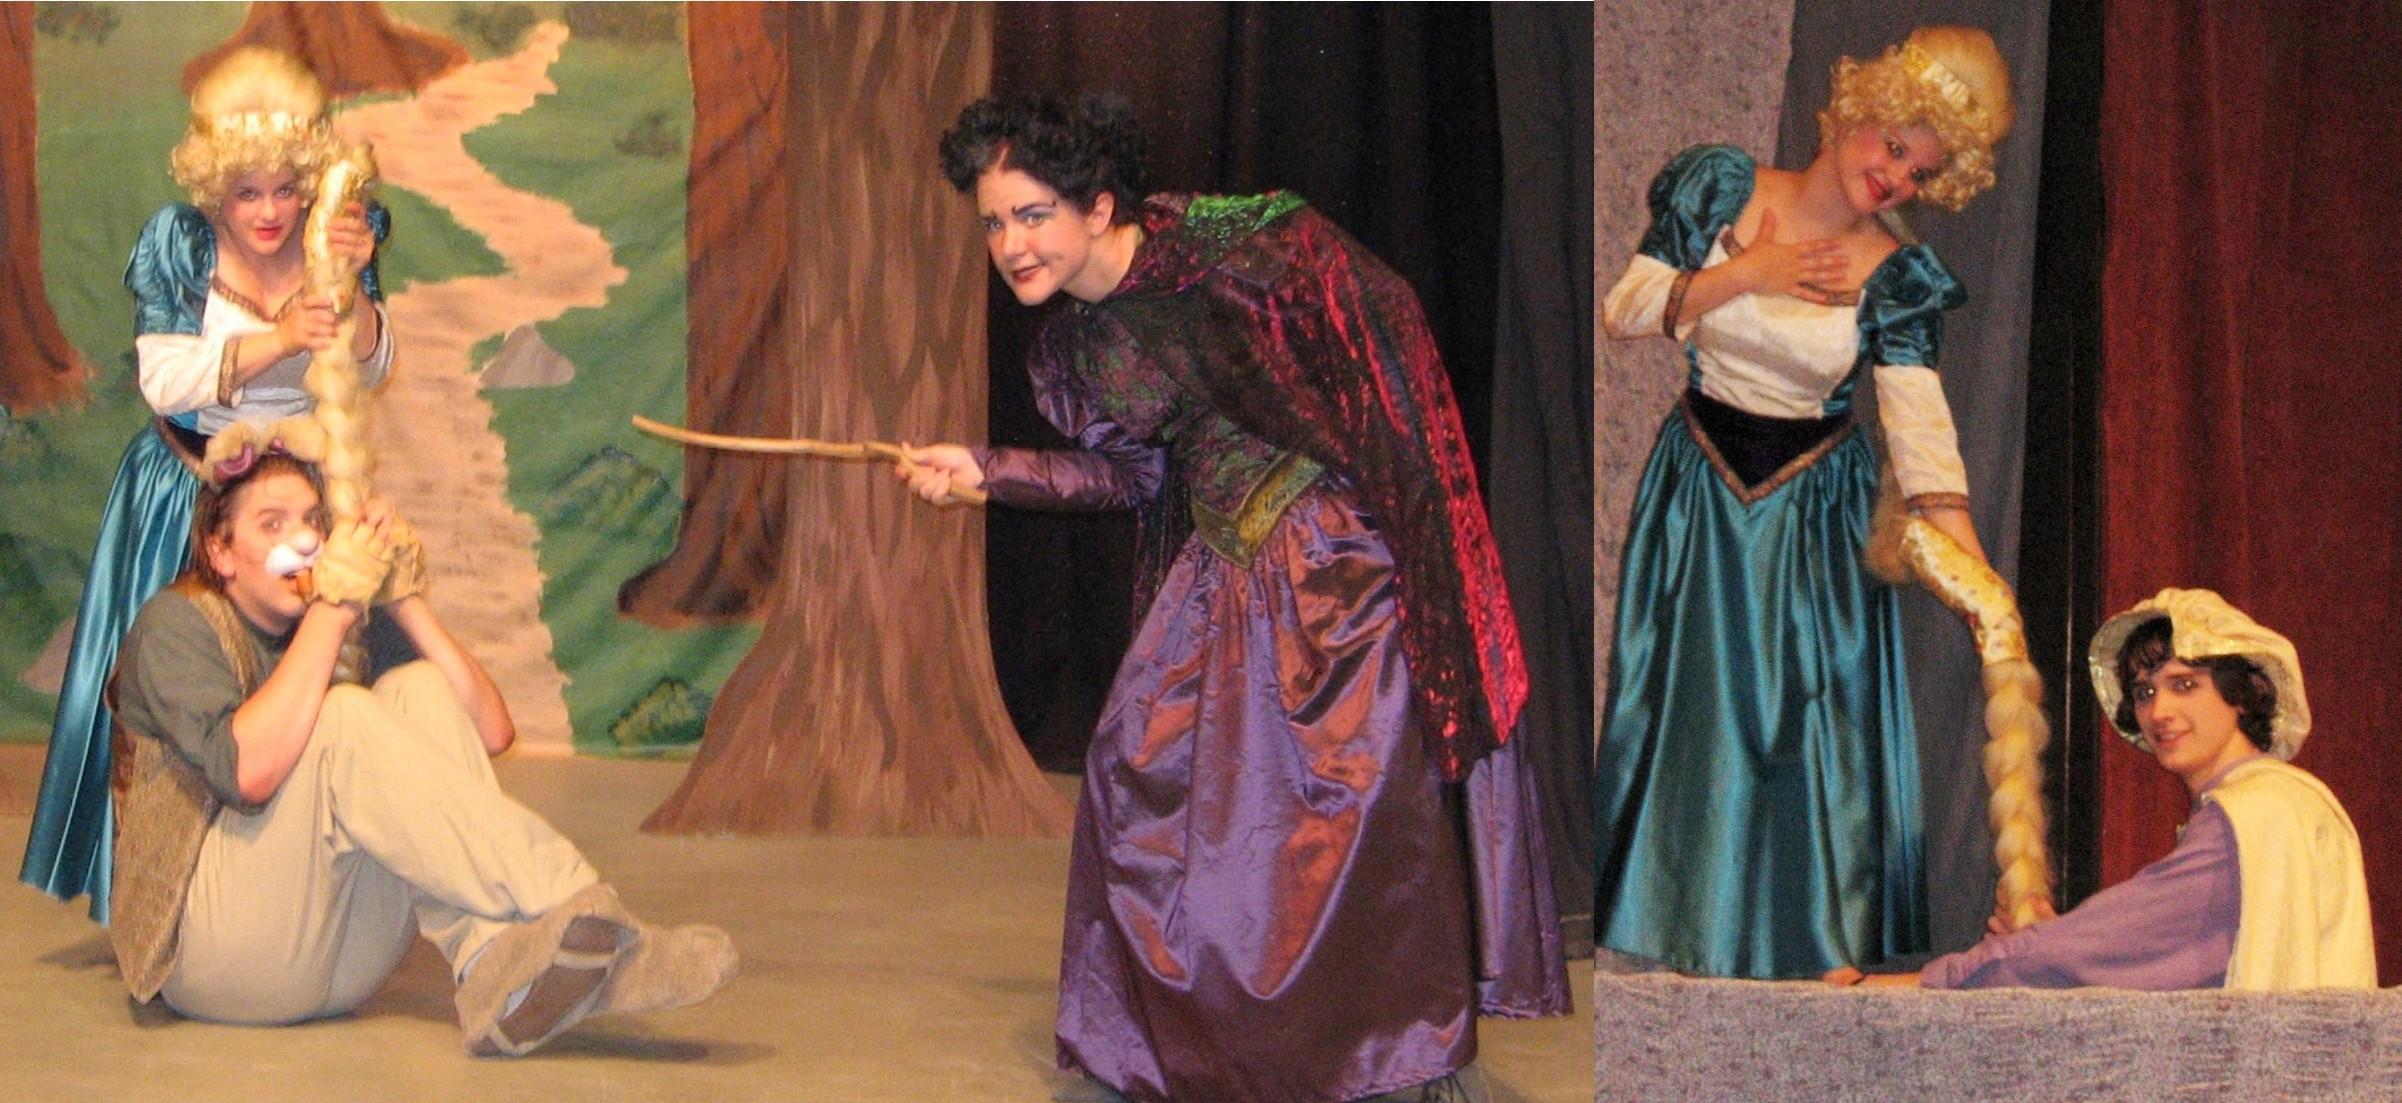 2007 Rapunzel